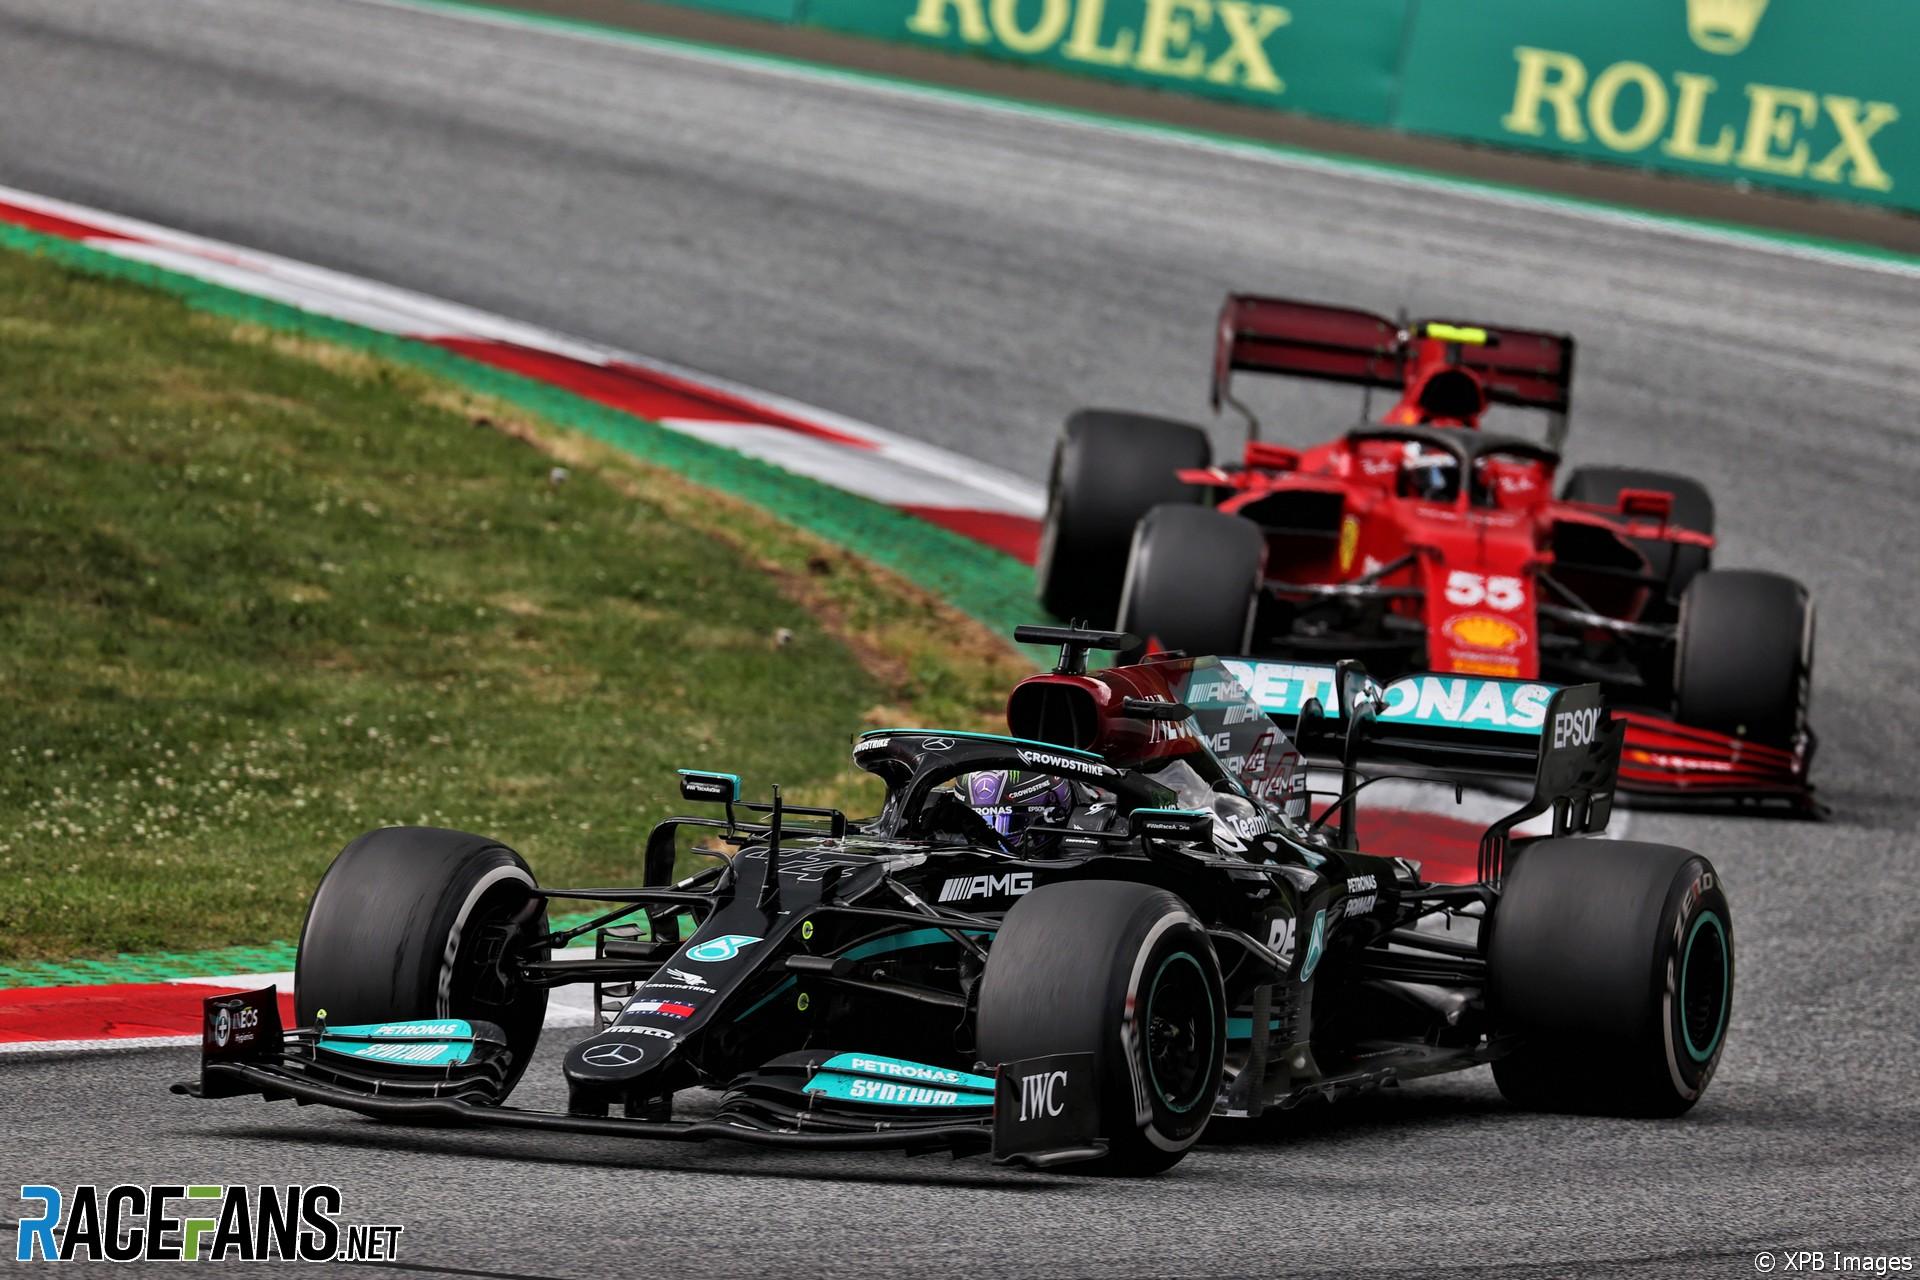 Lewis Hamilton, Mercedes, Red Bull Ring, 2021